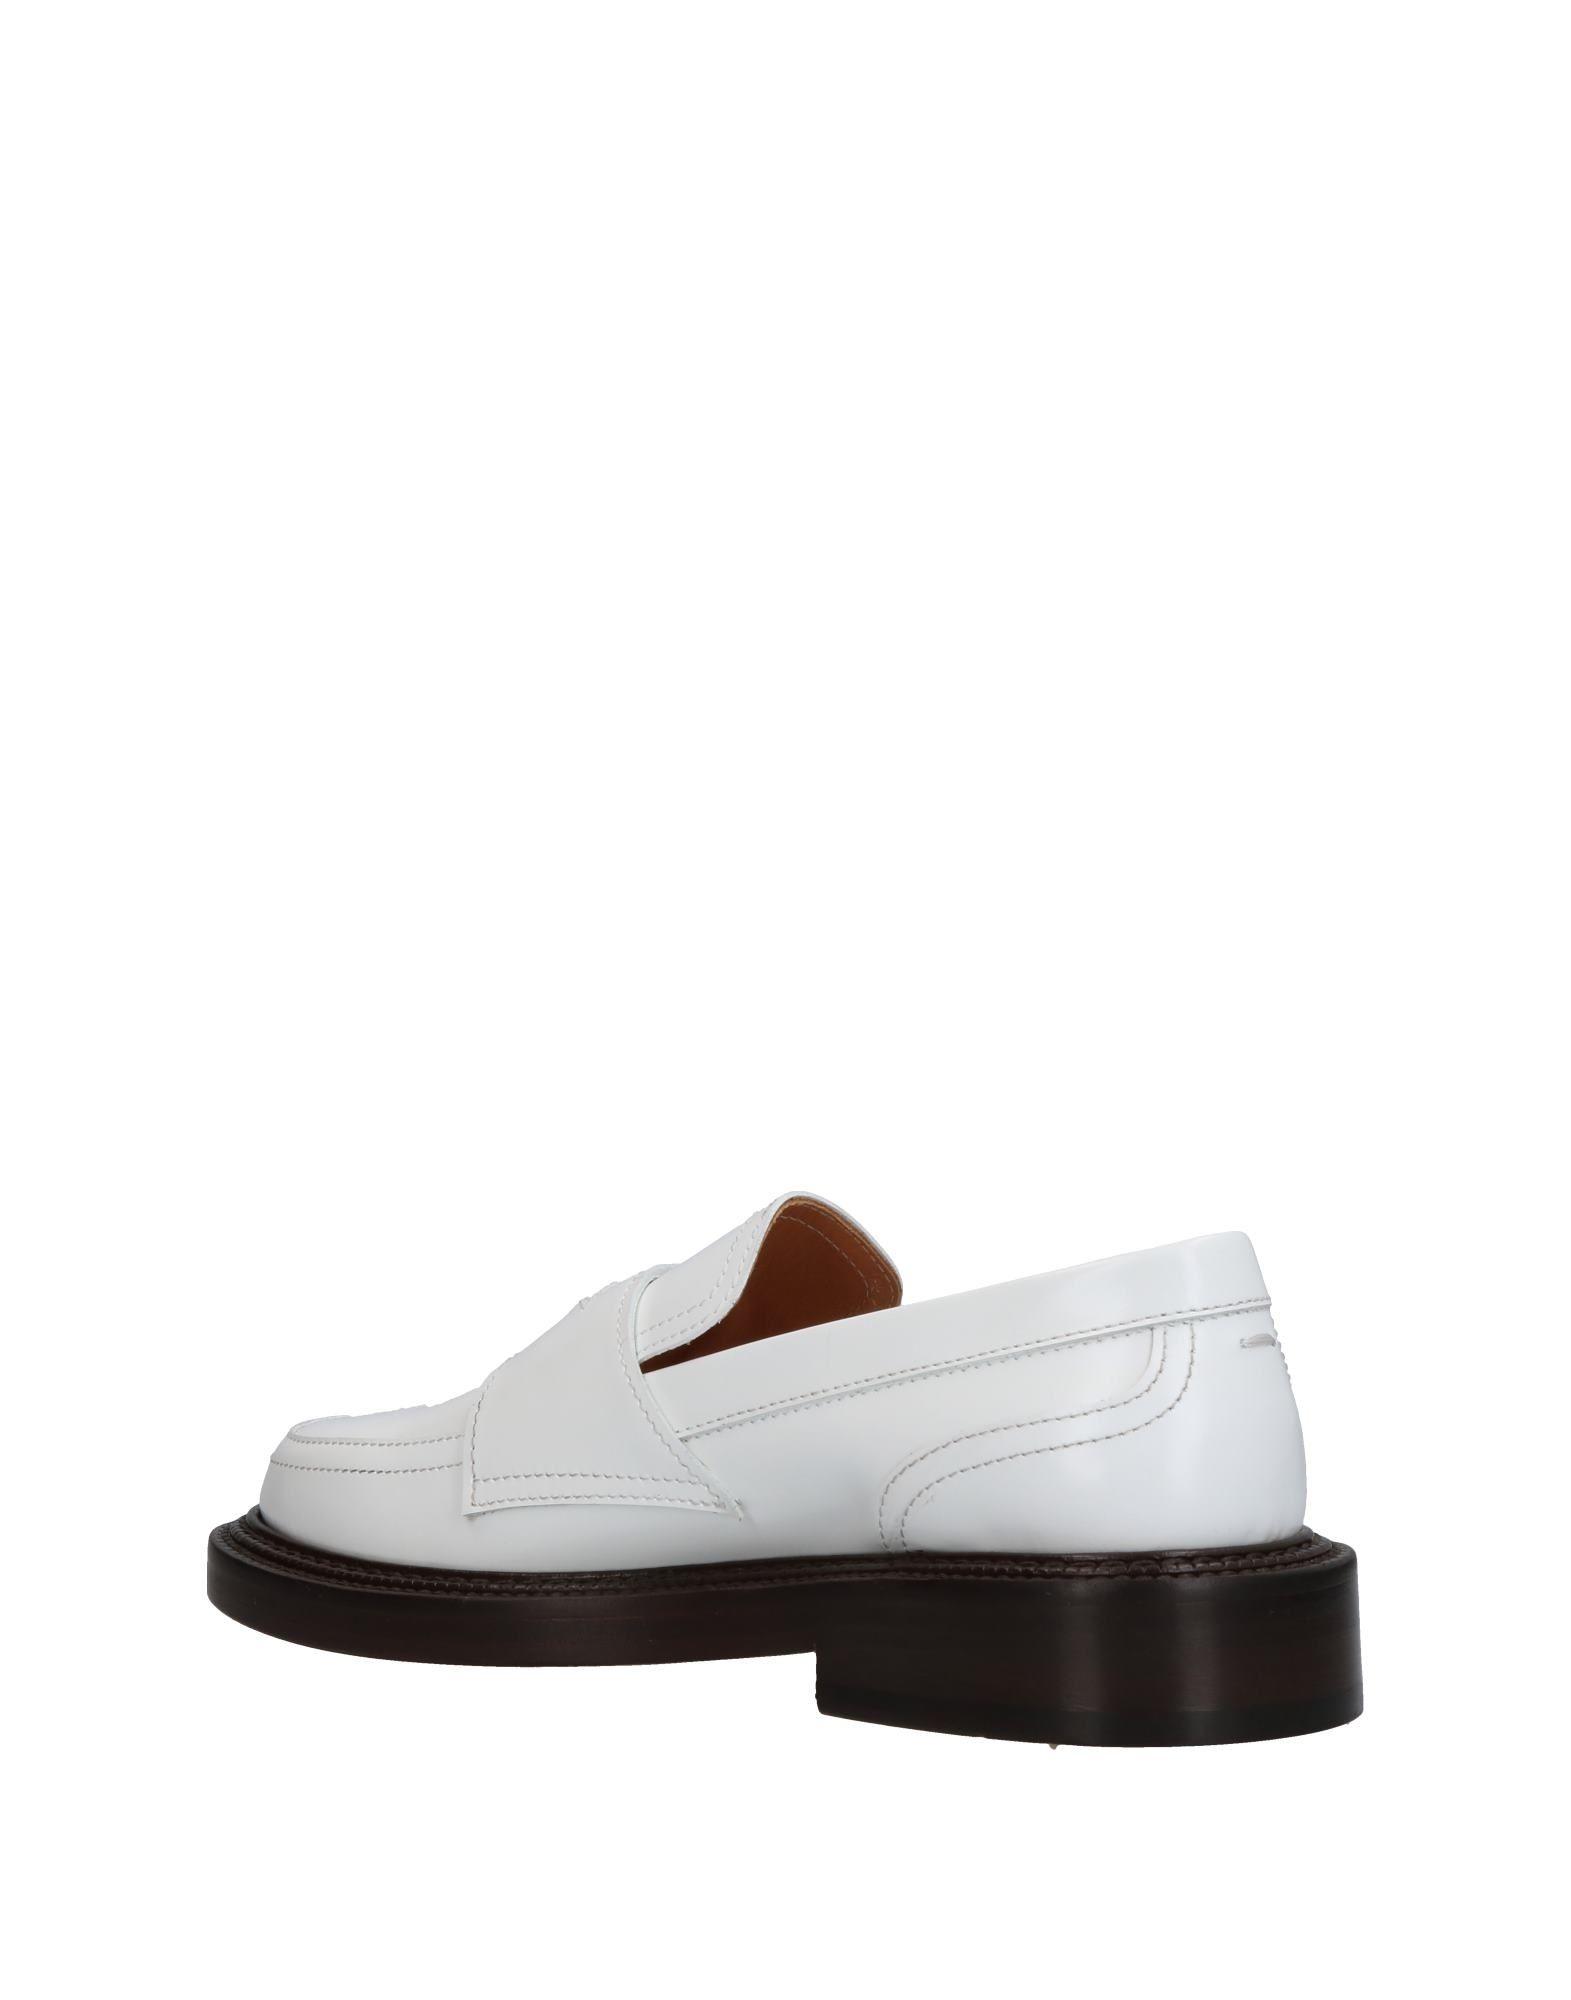 Maison Schuhe Margiela Mokassins Damen  11341739PK Neue Schuhe Maison 86ff1d